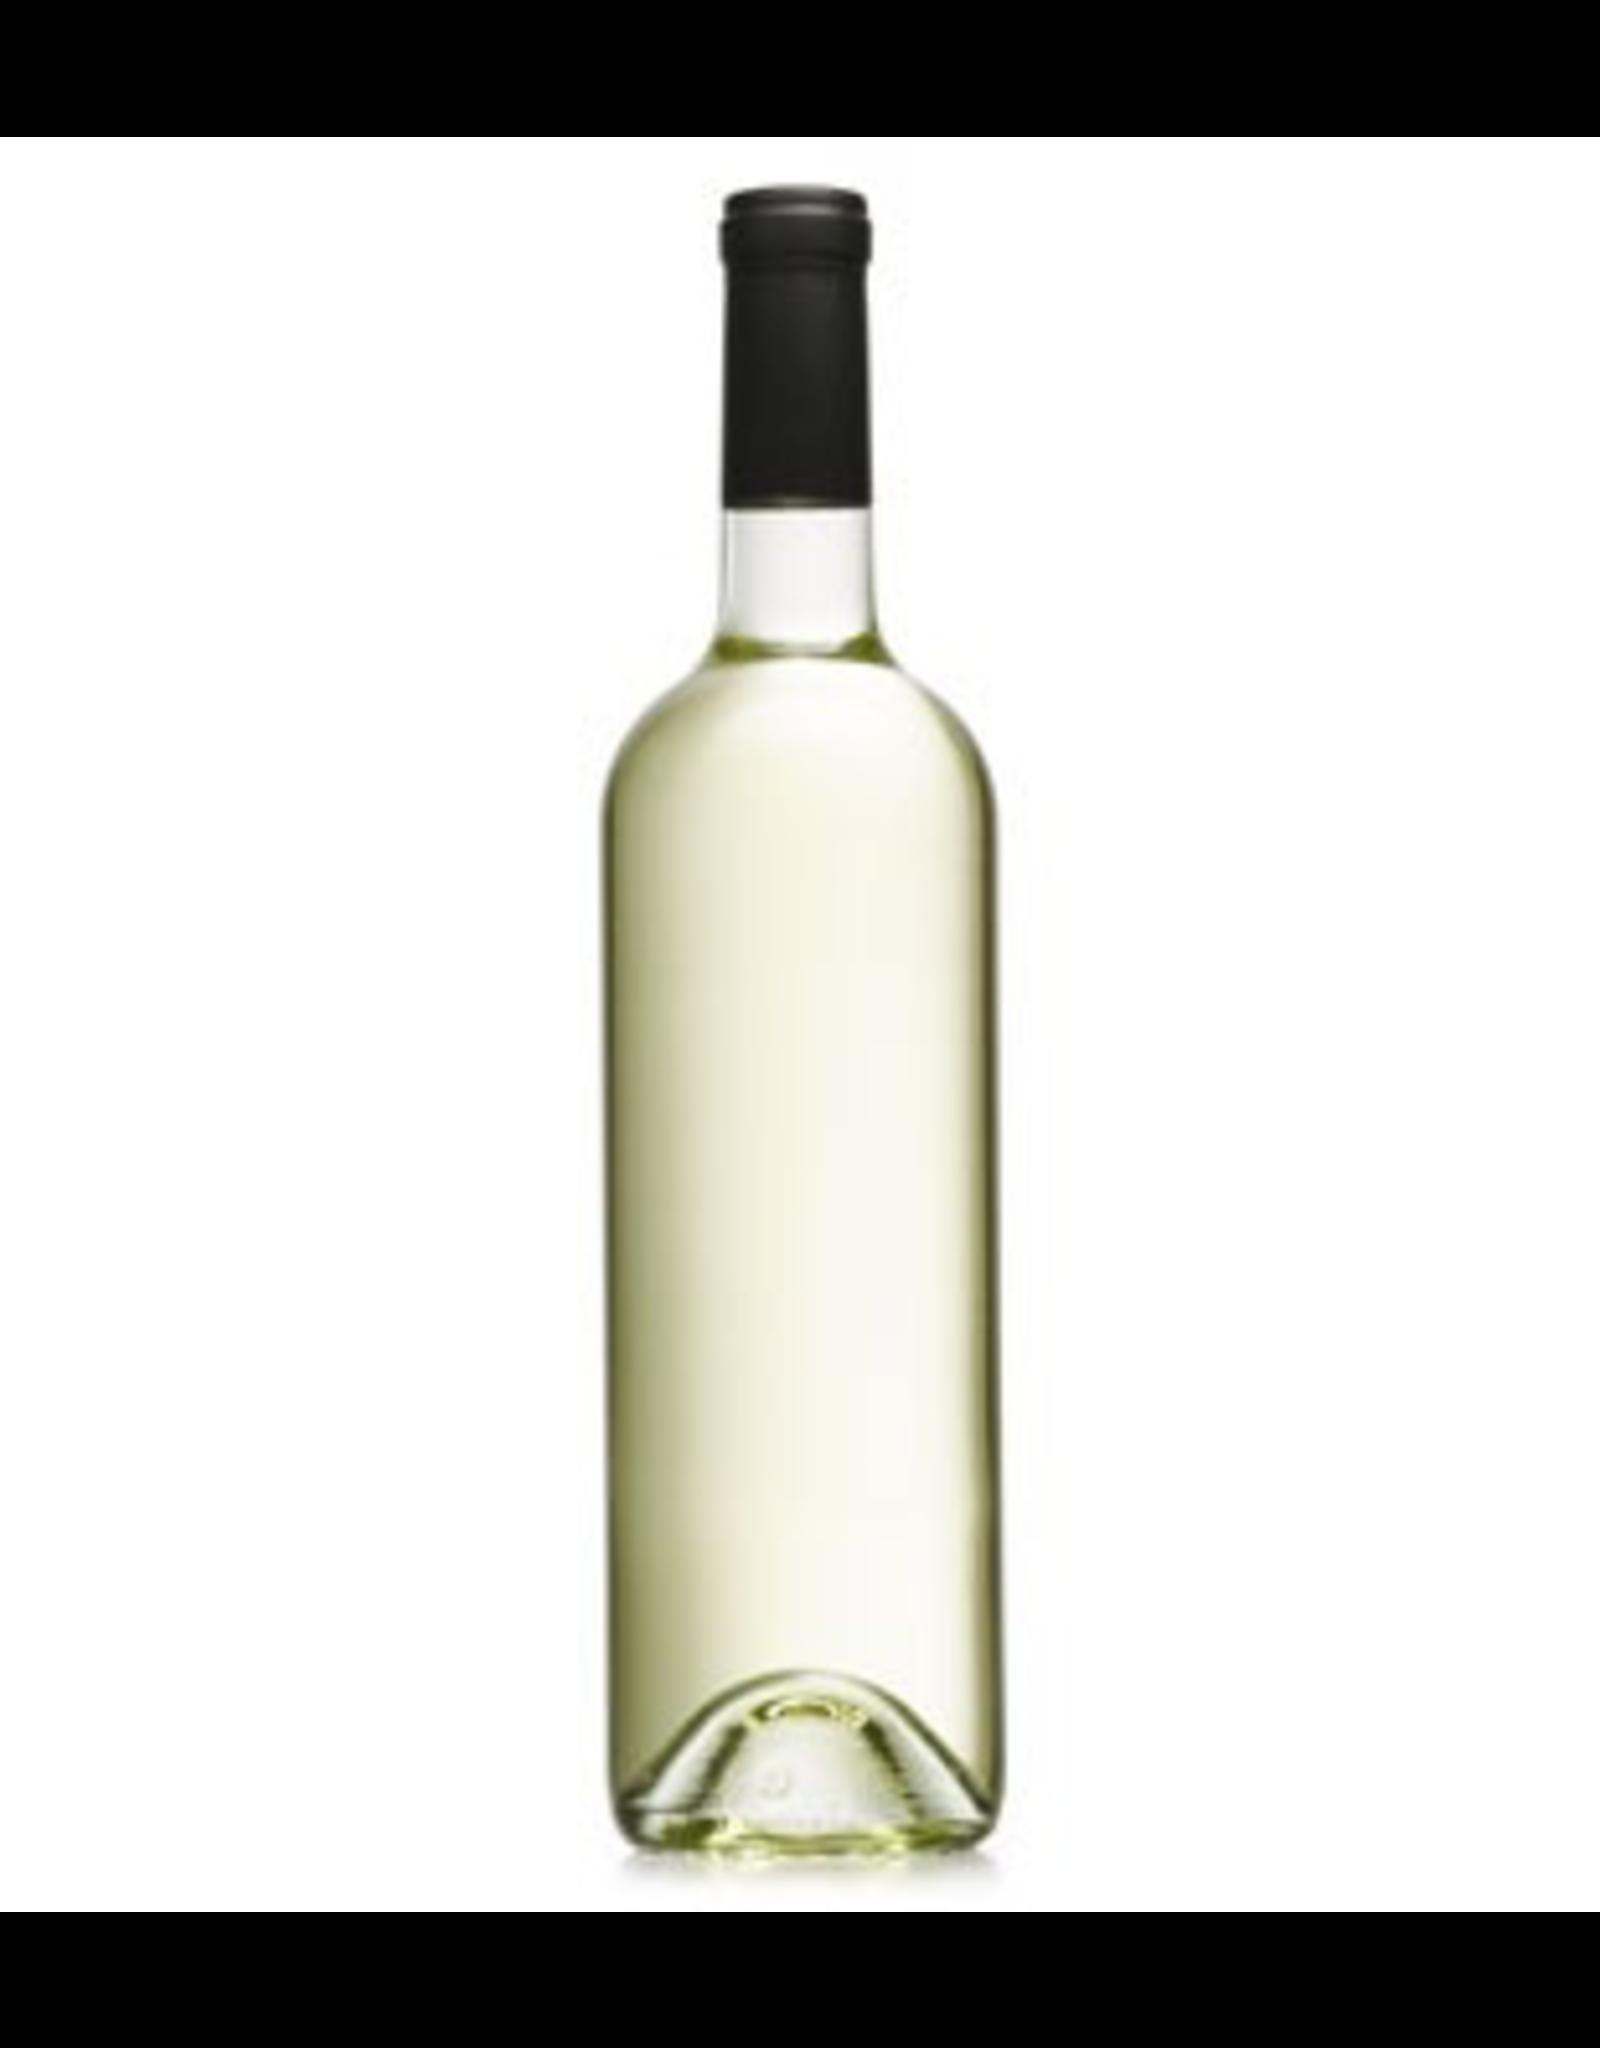 White Wine 1998, 500ml Antoine Arena Vendages Tardives (Late Harvest), Vermentino, Vin de Corse Calvi, Corsica, France, 14% Alc,